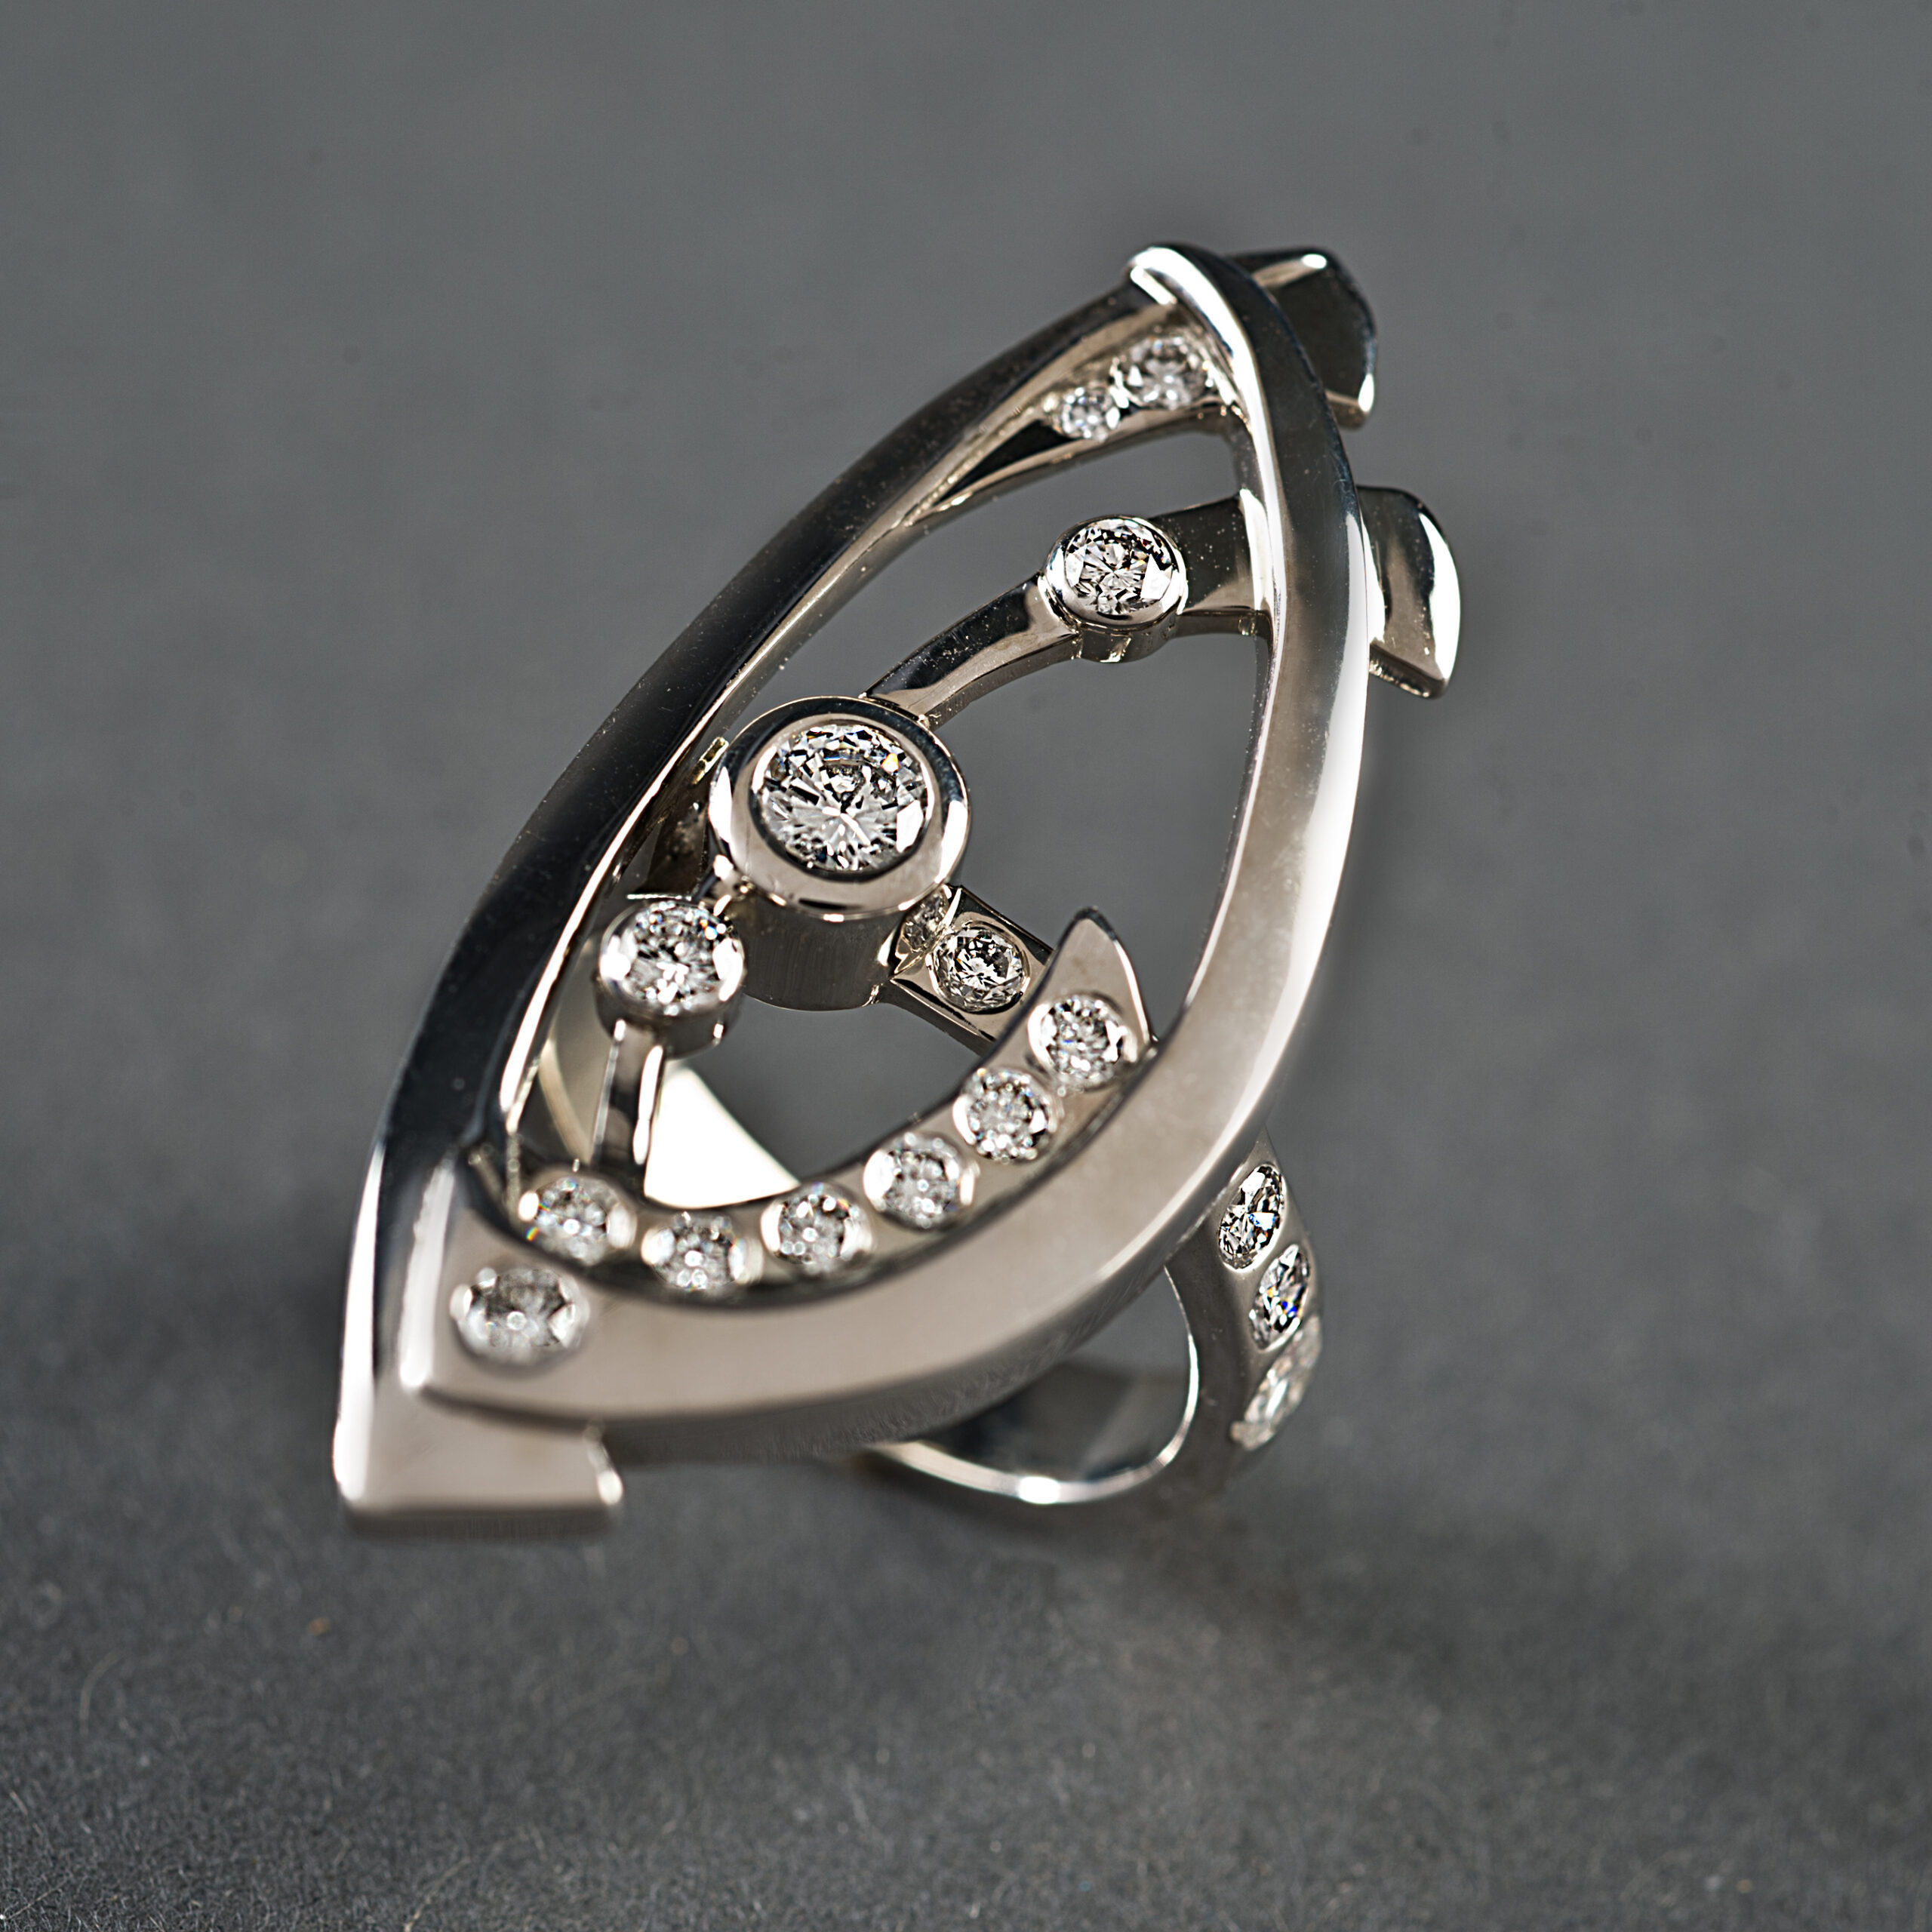 Castellano Fine Jewelry and Gifts